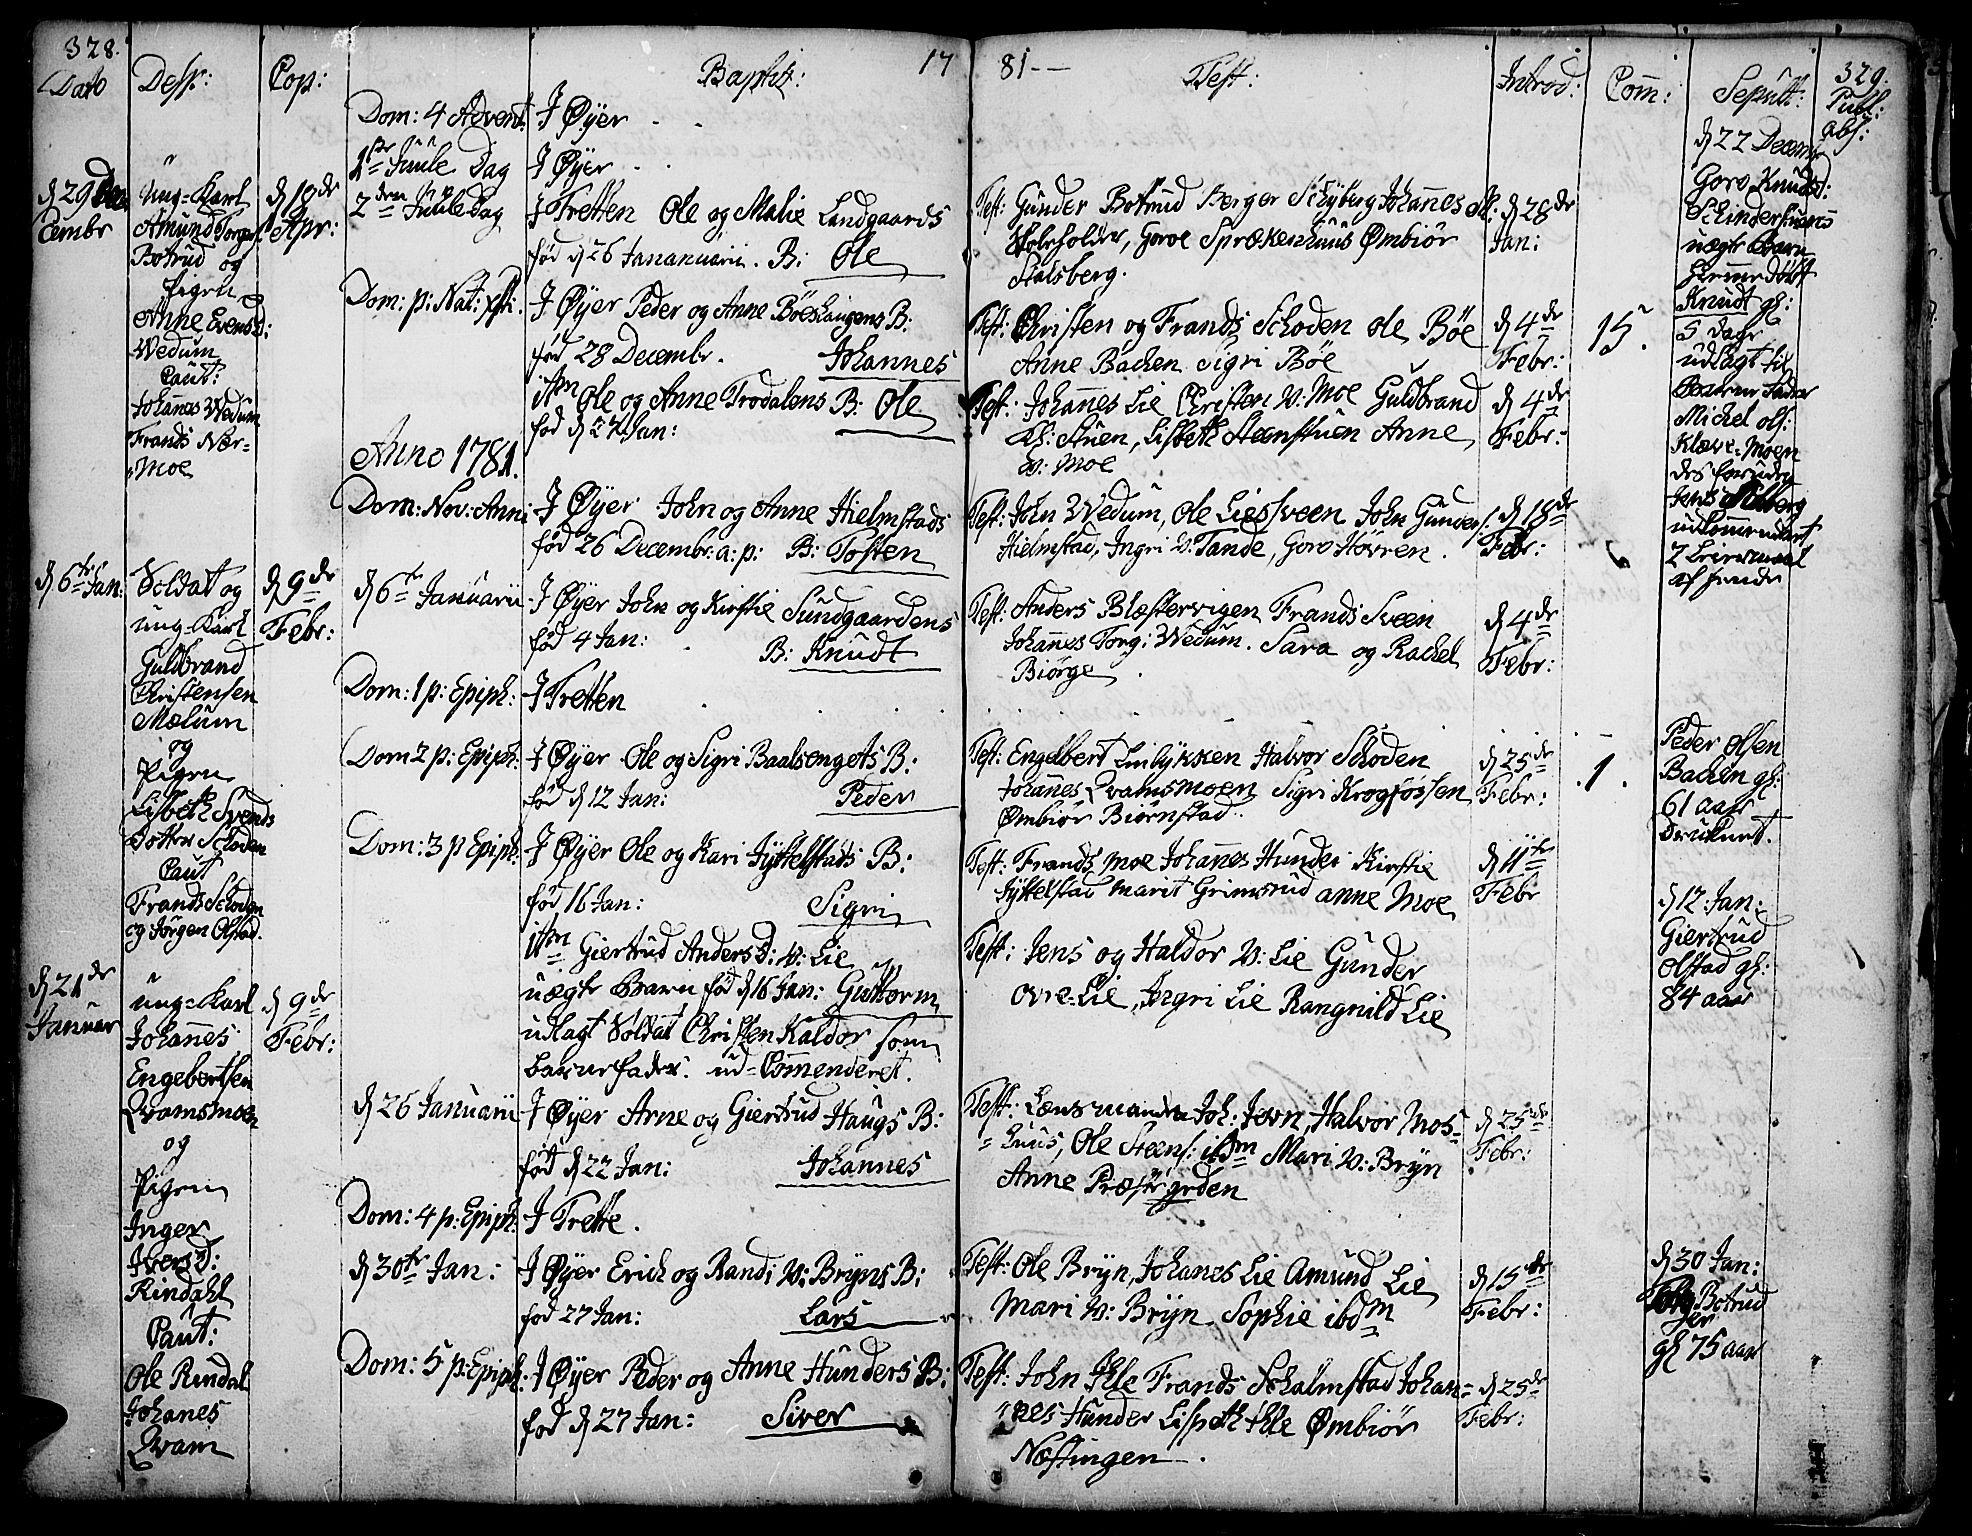 SAH, Øyer prestekontor, Ministerialbok nr. 2, 1733-1784, s. 328-329